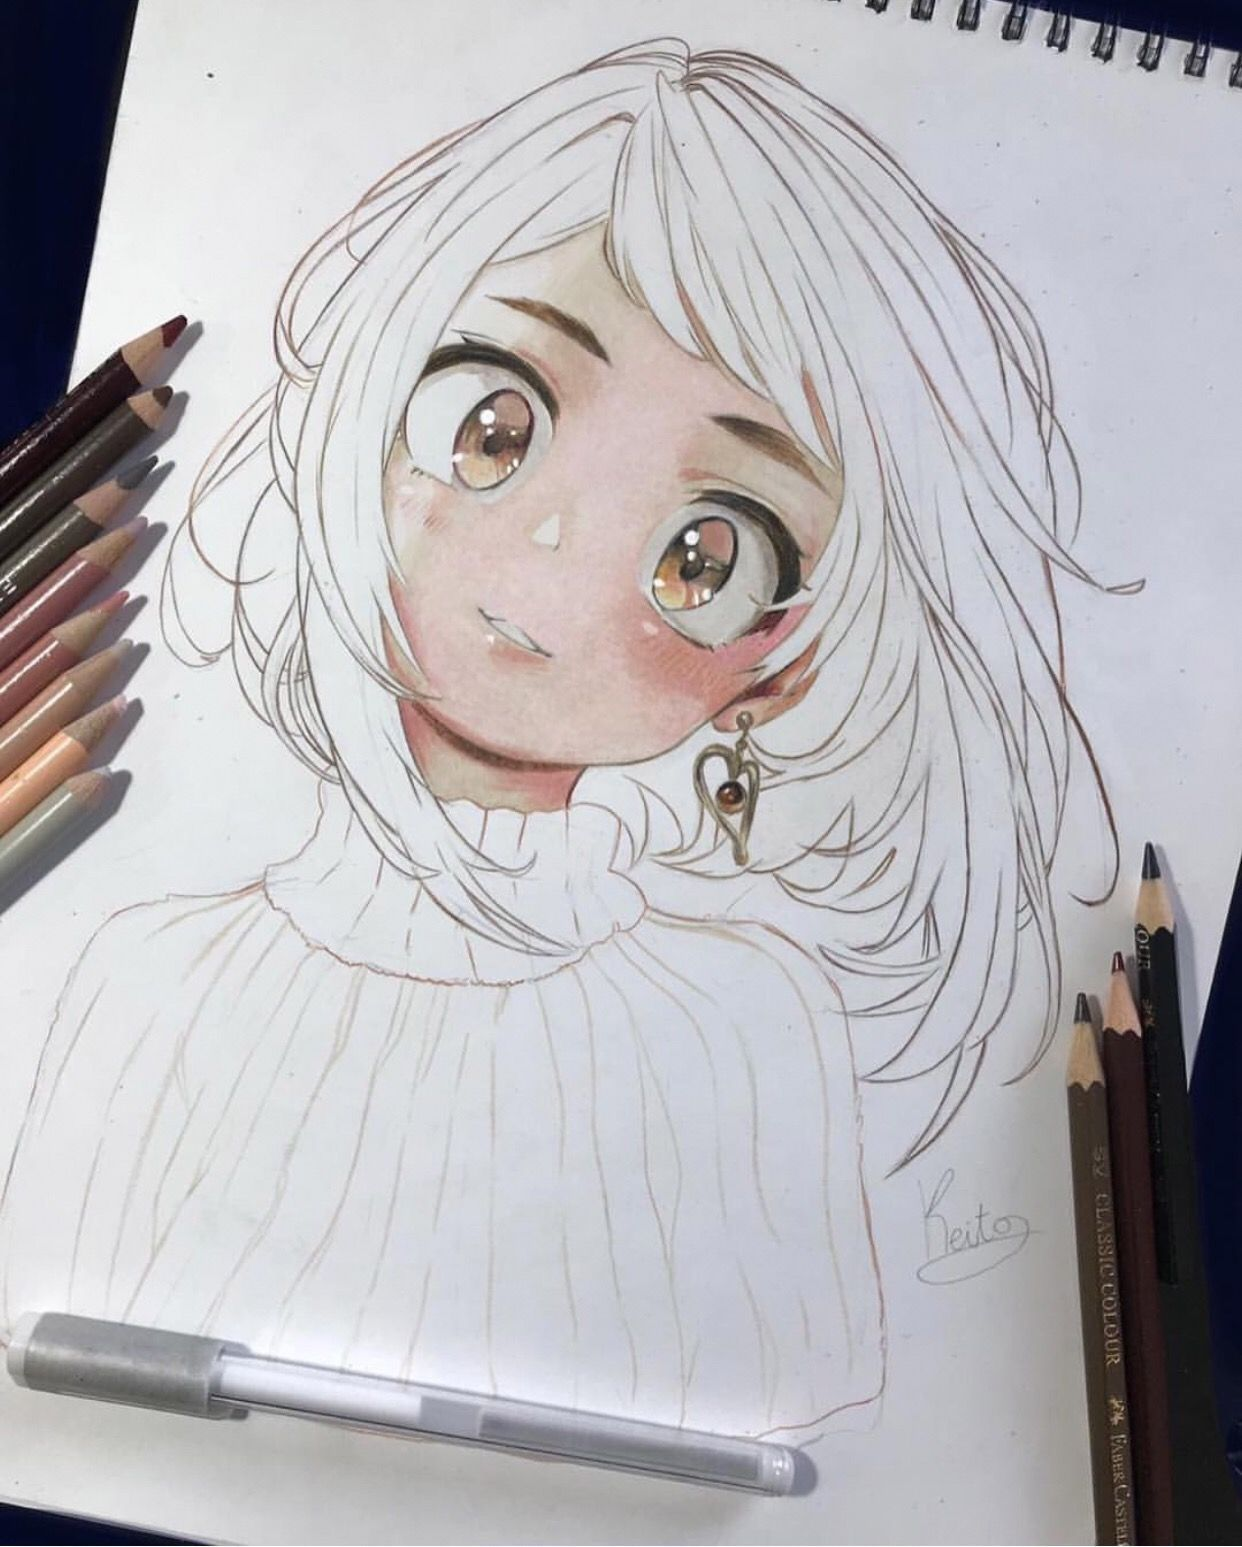 Uraraka By Keito Kun Visit Our Website For More Anime And Animeart Ochaco Uraraka Also Known By H Anime Art Anime Drawings Anime Sketch